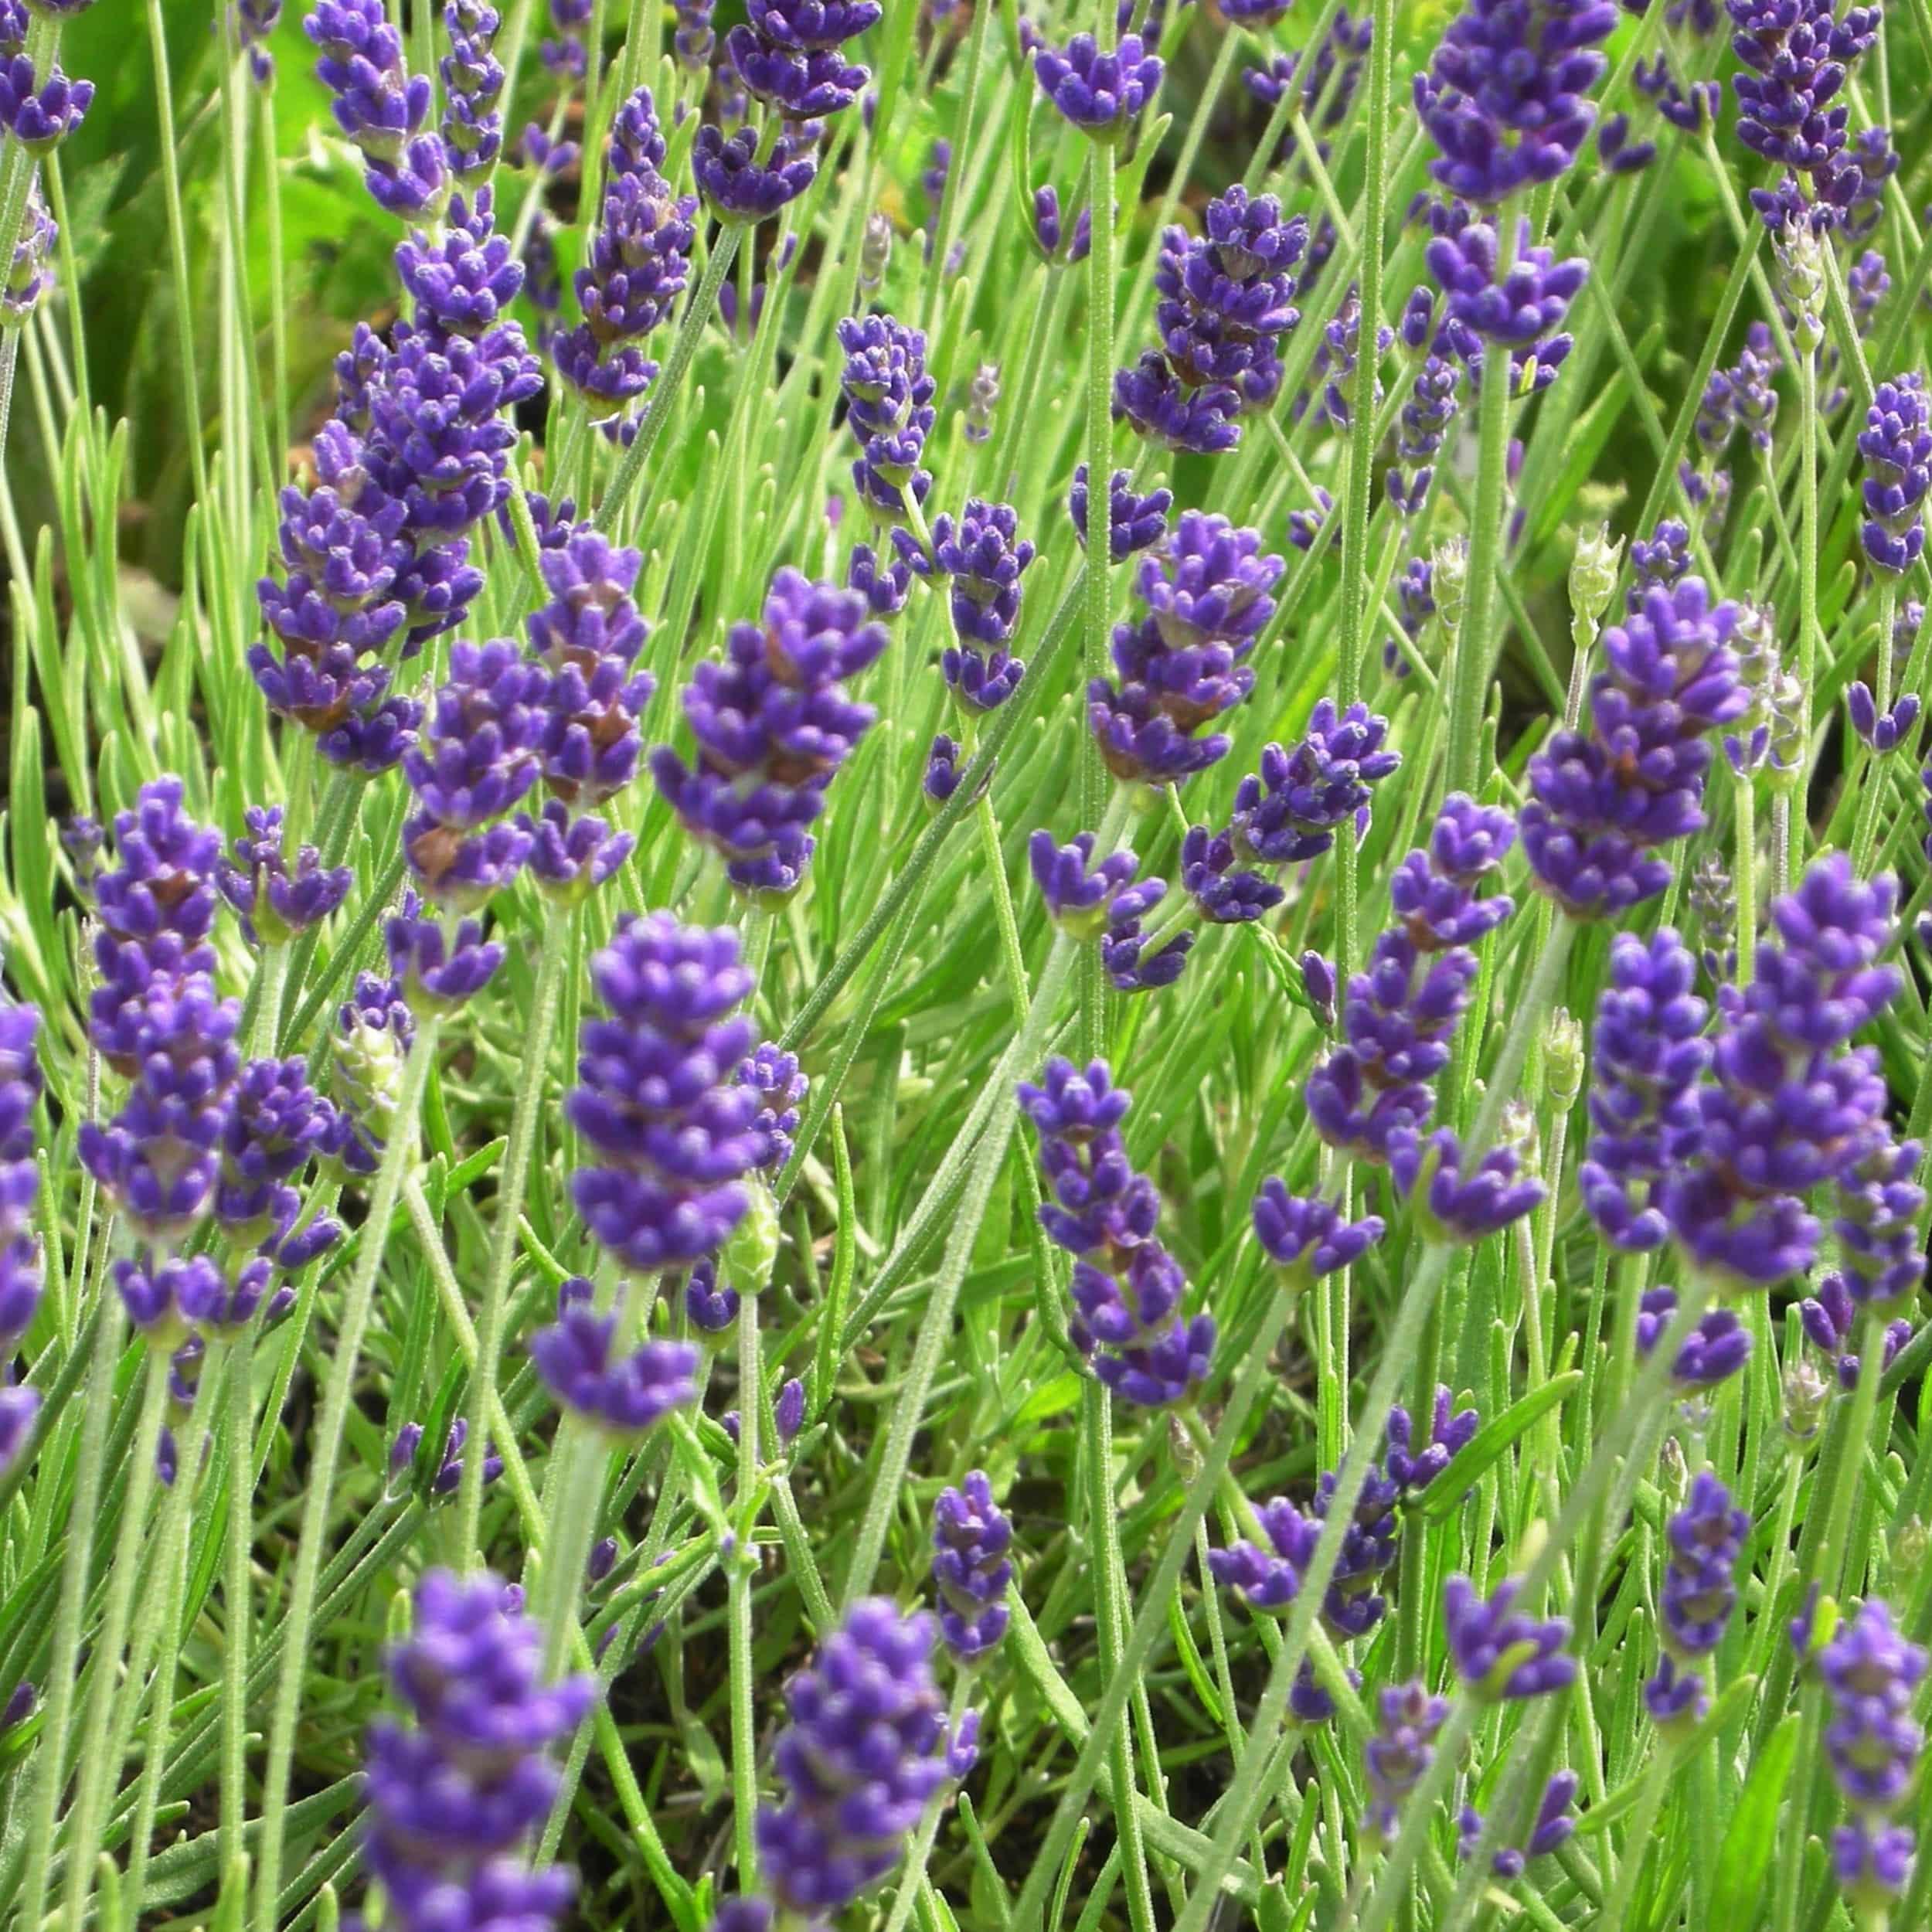 Lavandula angustifolia 'Hidcote Blue' - Garten-Lavendel